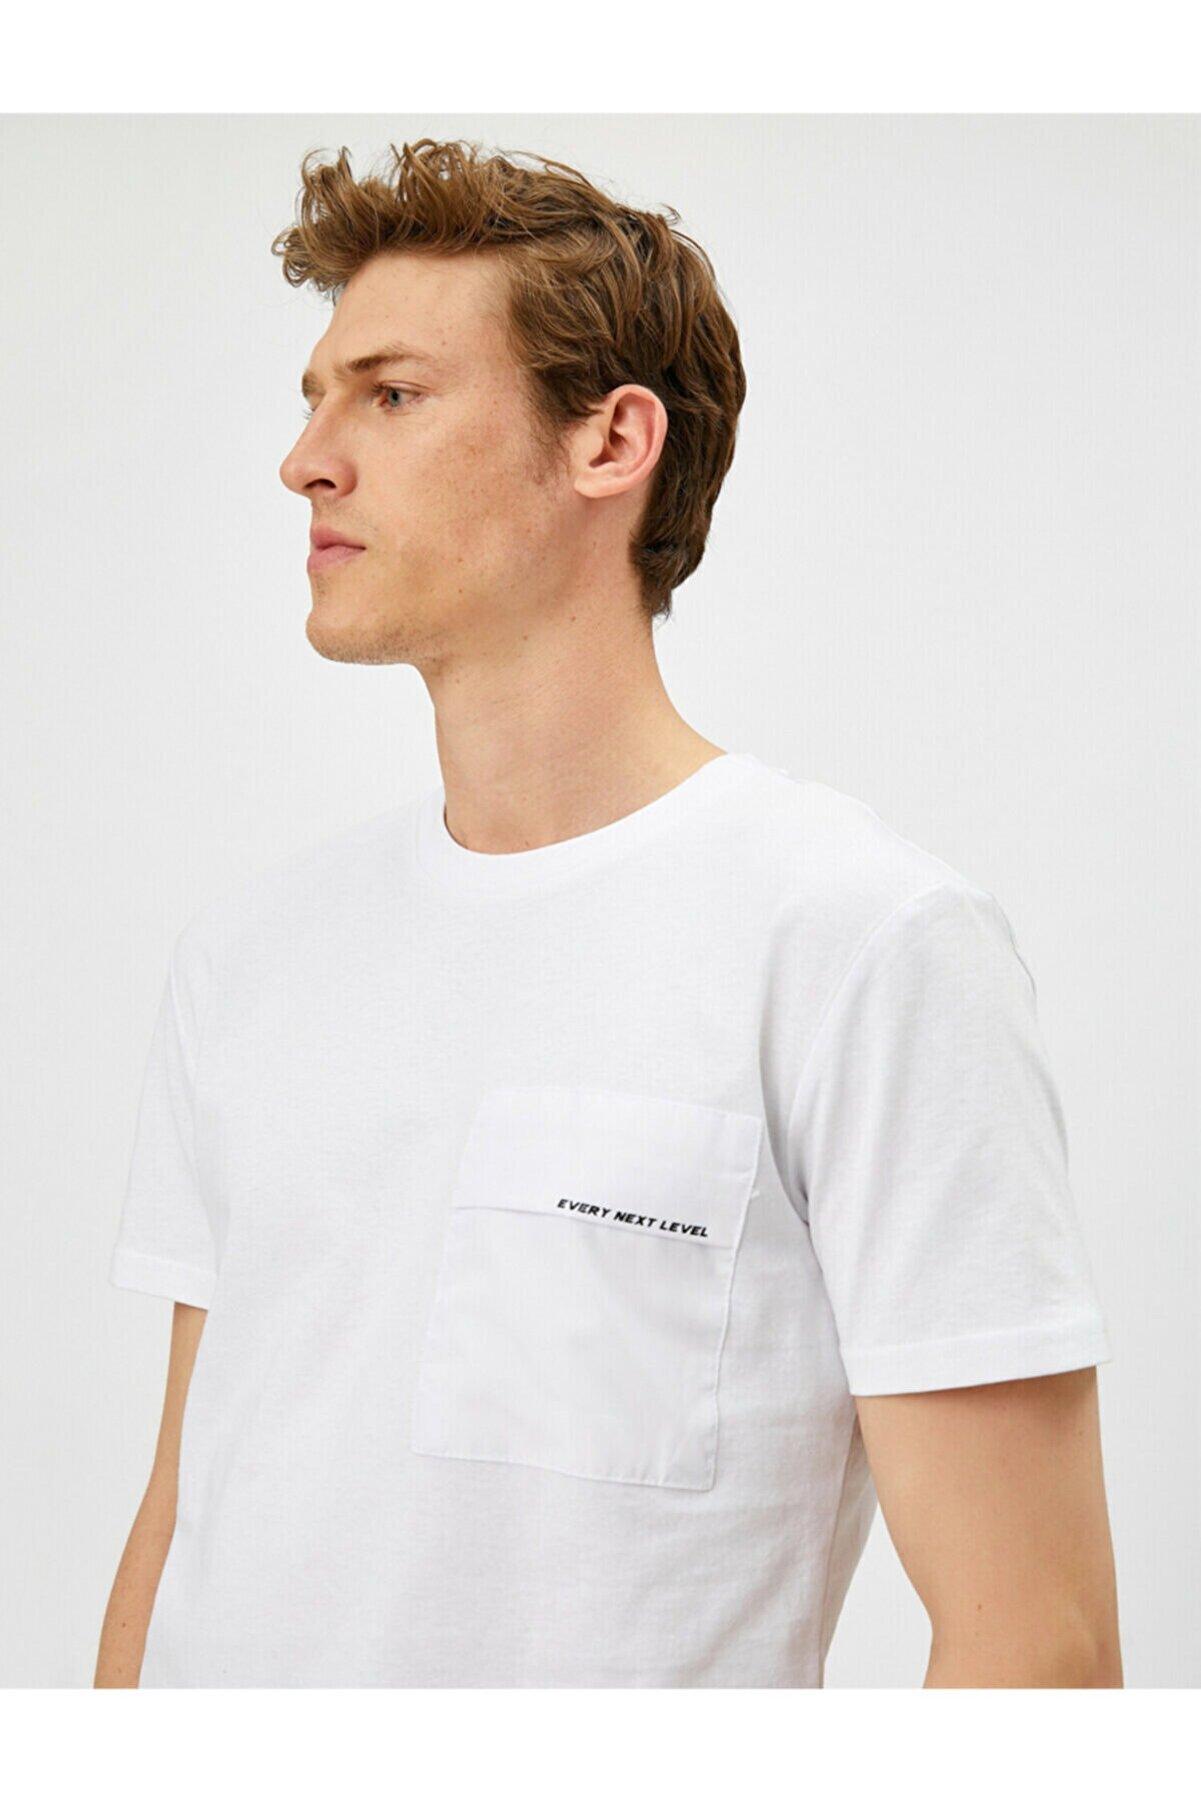 Koton Erkek Yazili Kisa Kollu Pamuklu Bisiklet Yaka T-Shirt